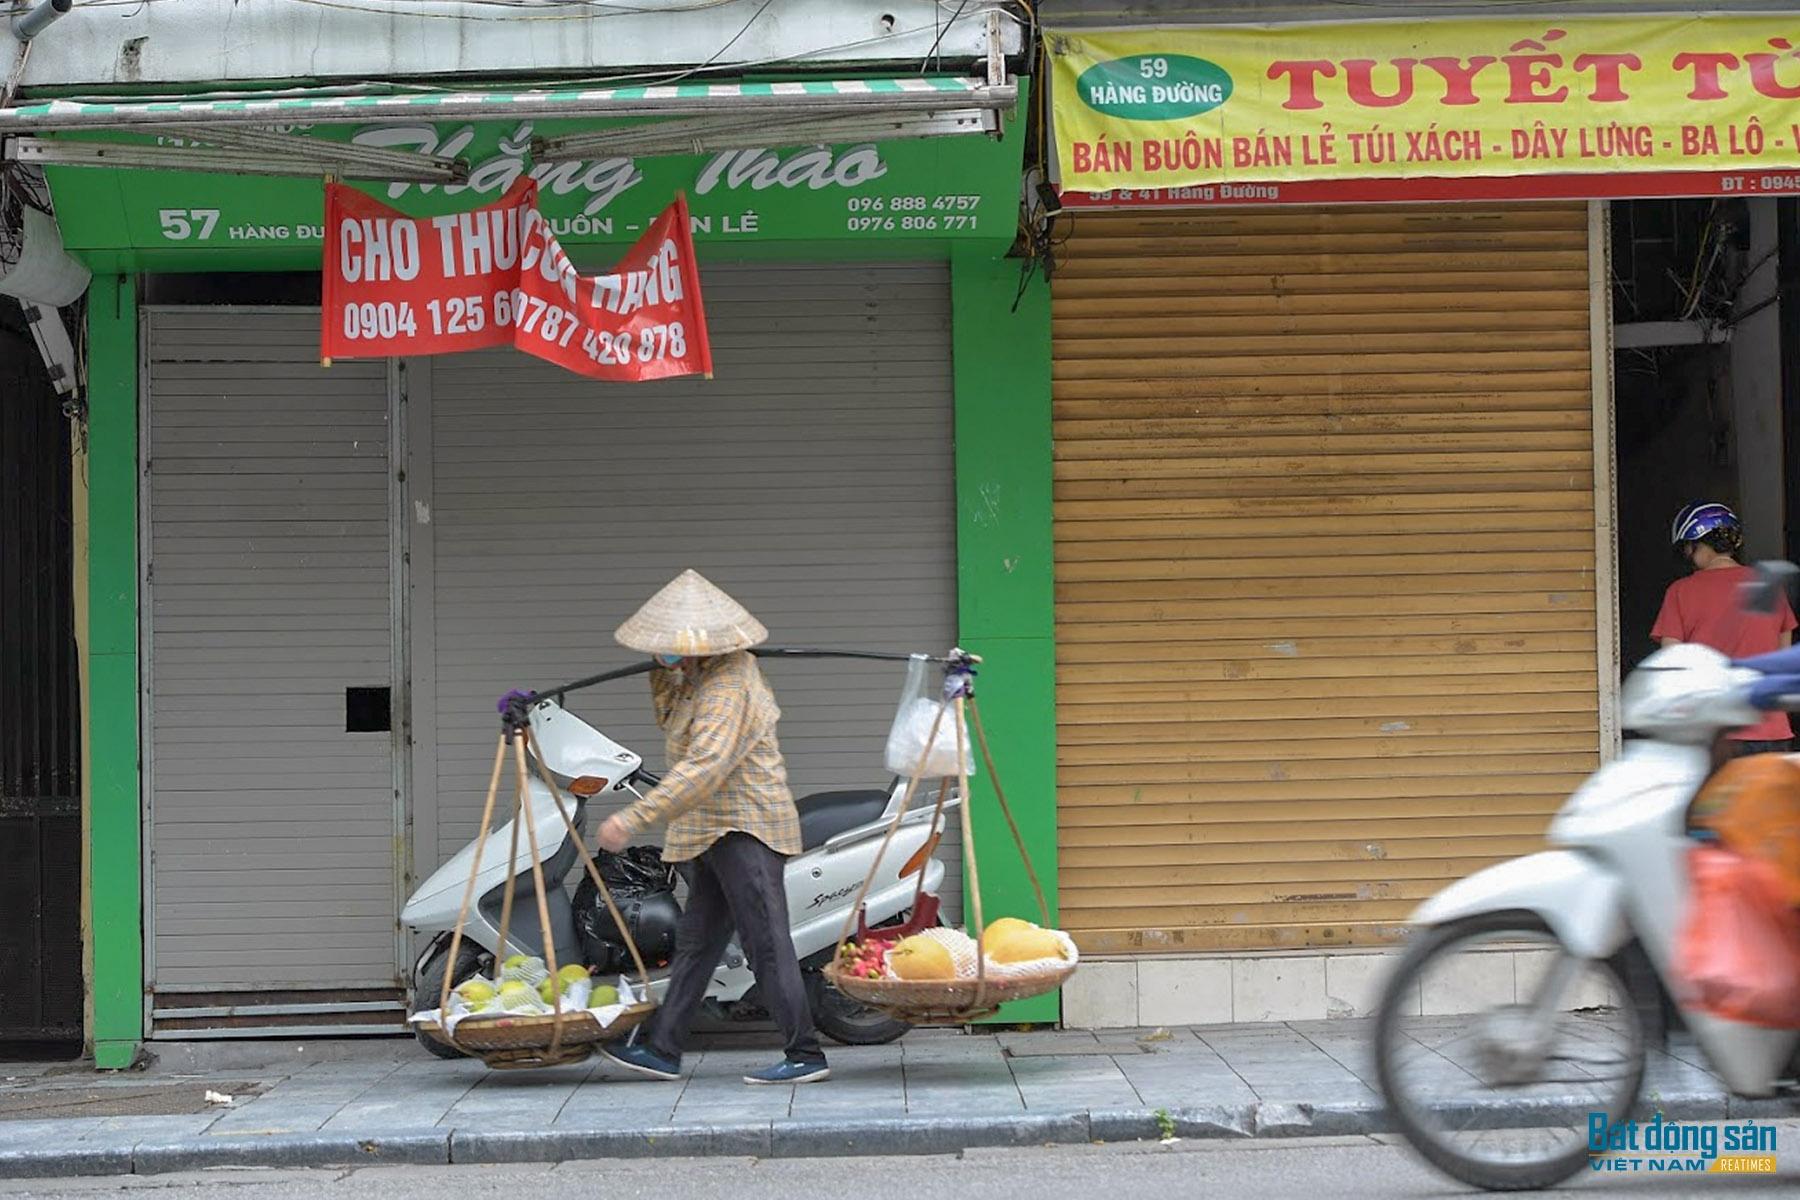 hang loat cua hang im im dong bien cho thue mat bang giang khap pho co